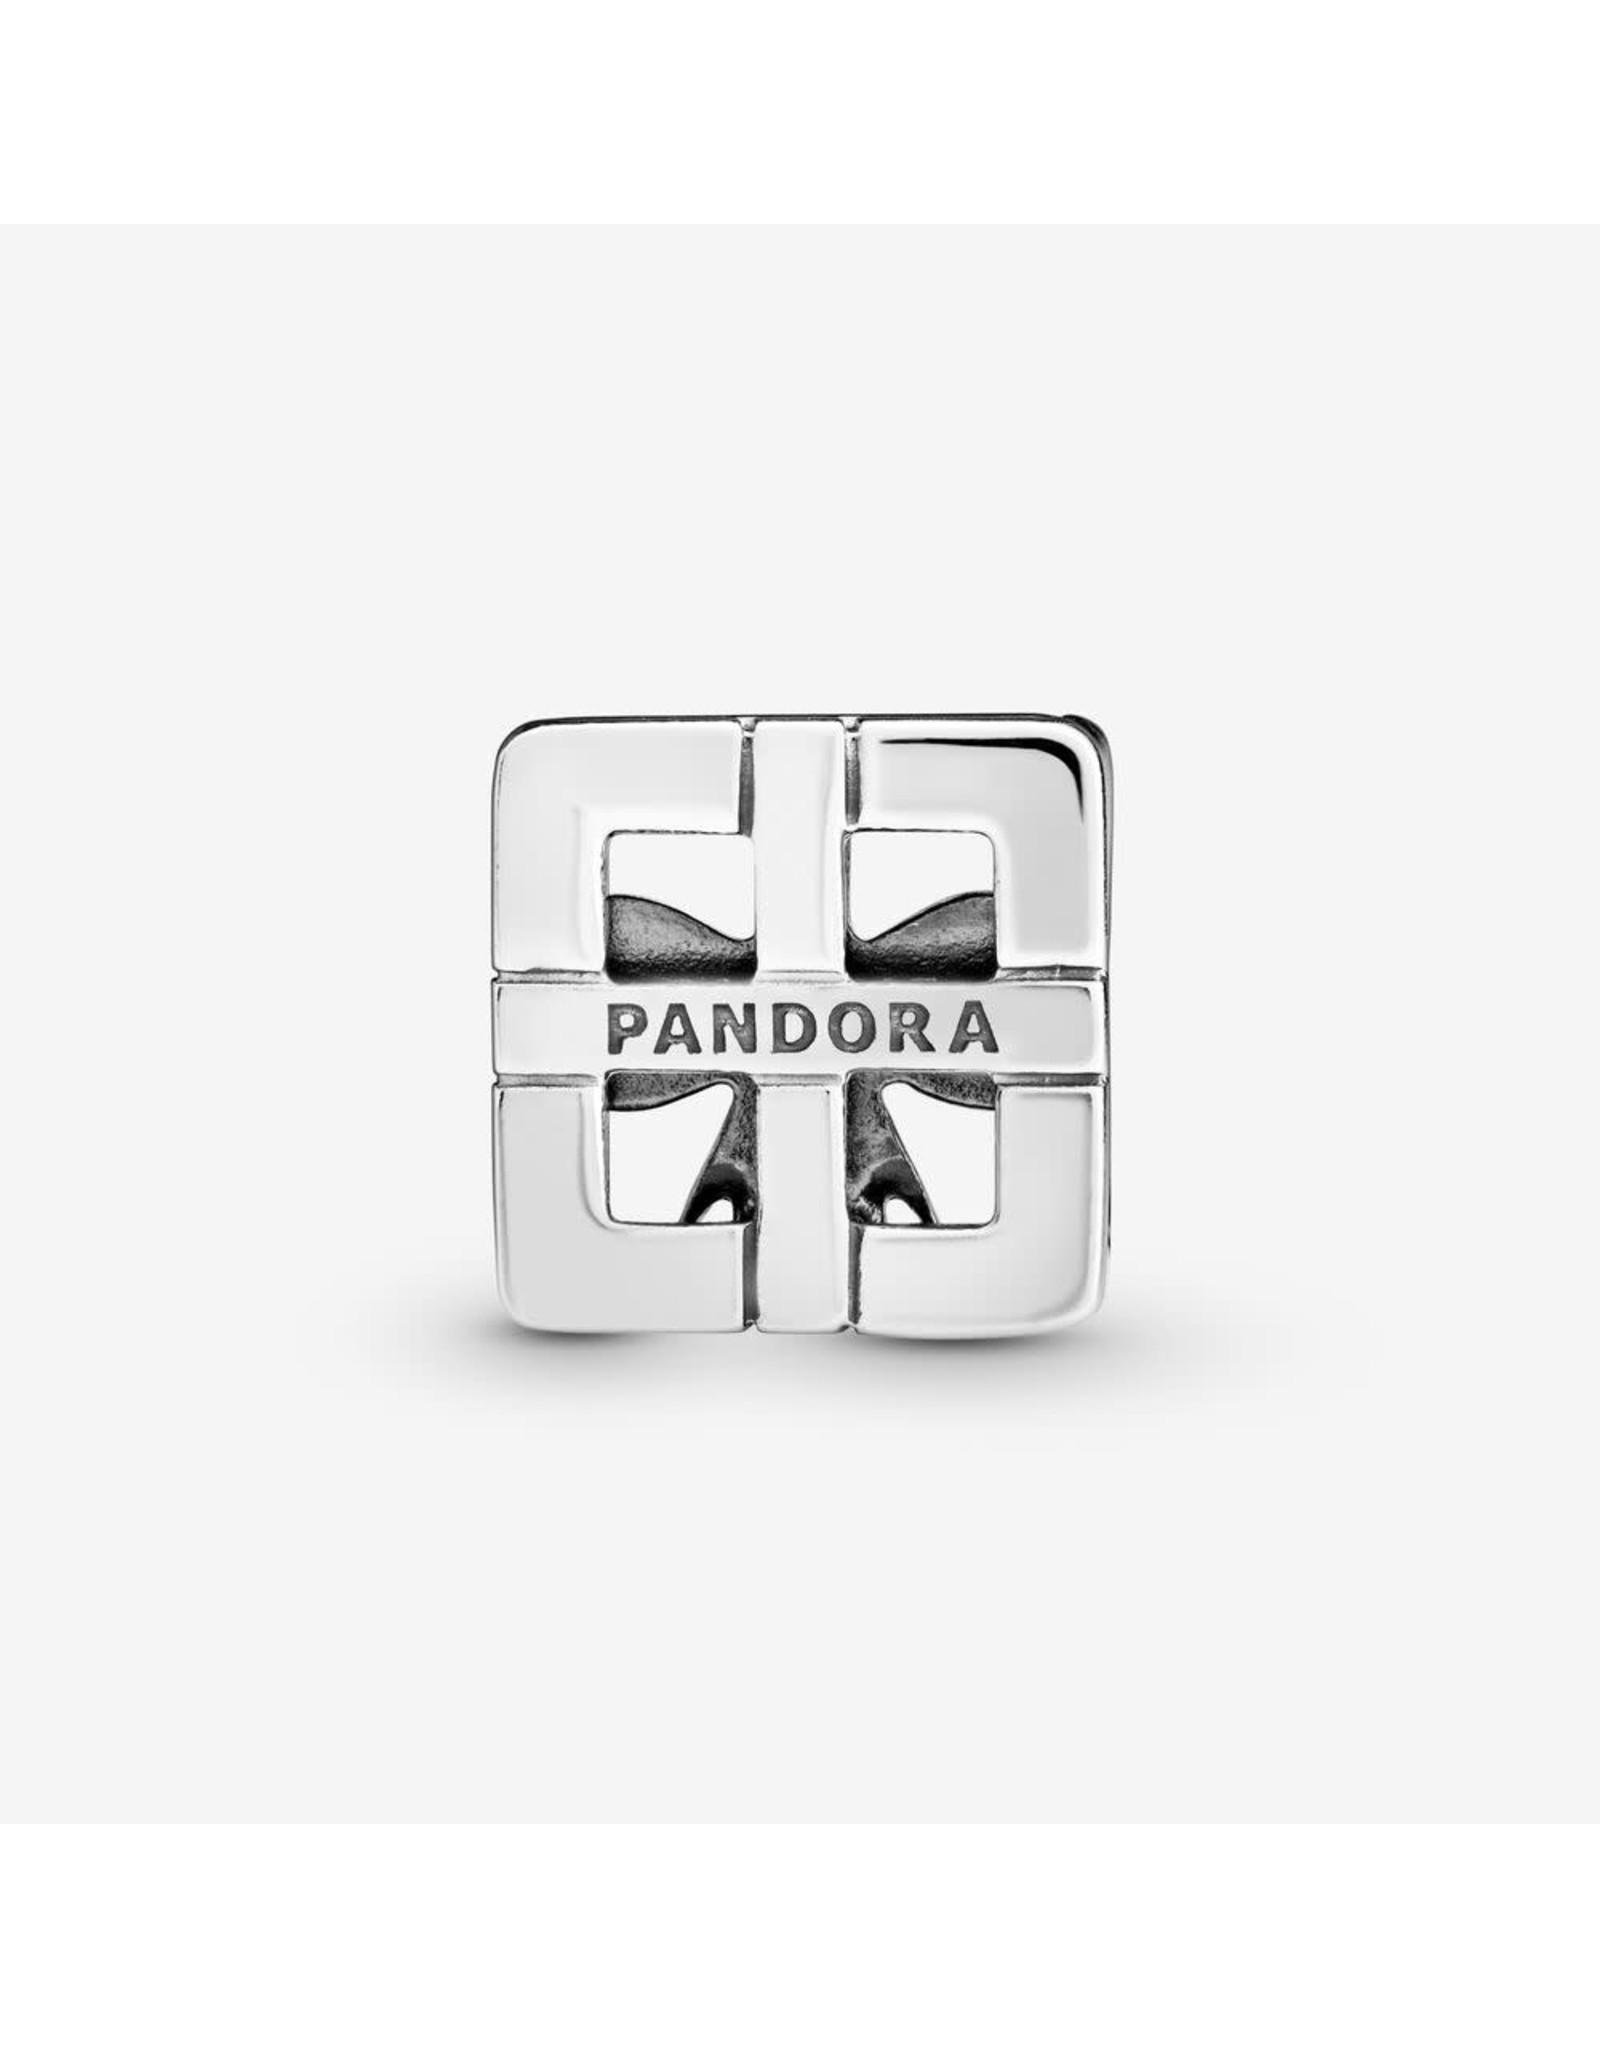 Pandora Pandora Reflexions Gift Clip Charm In Sterling Silver